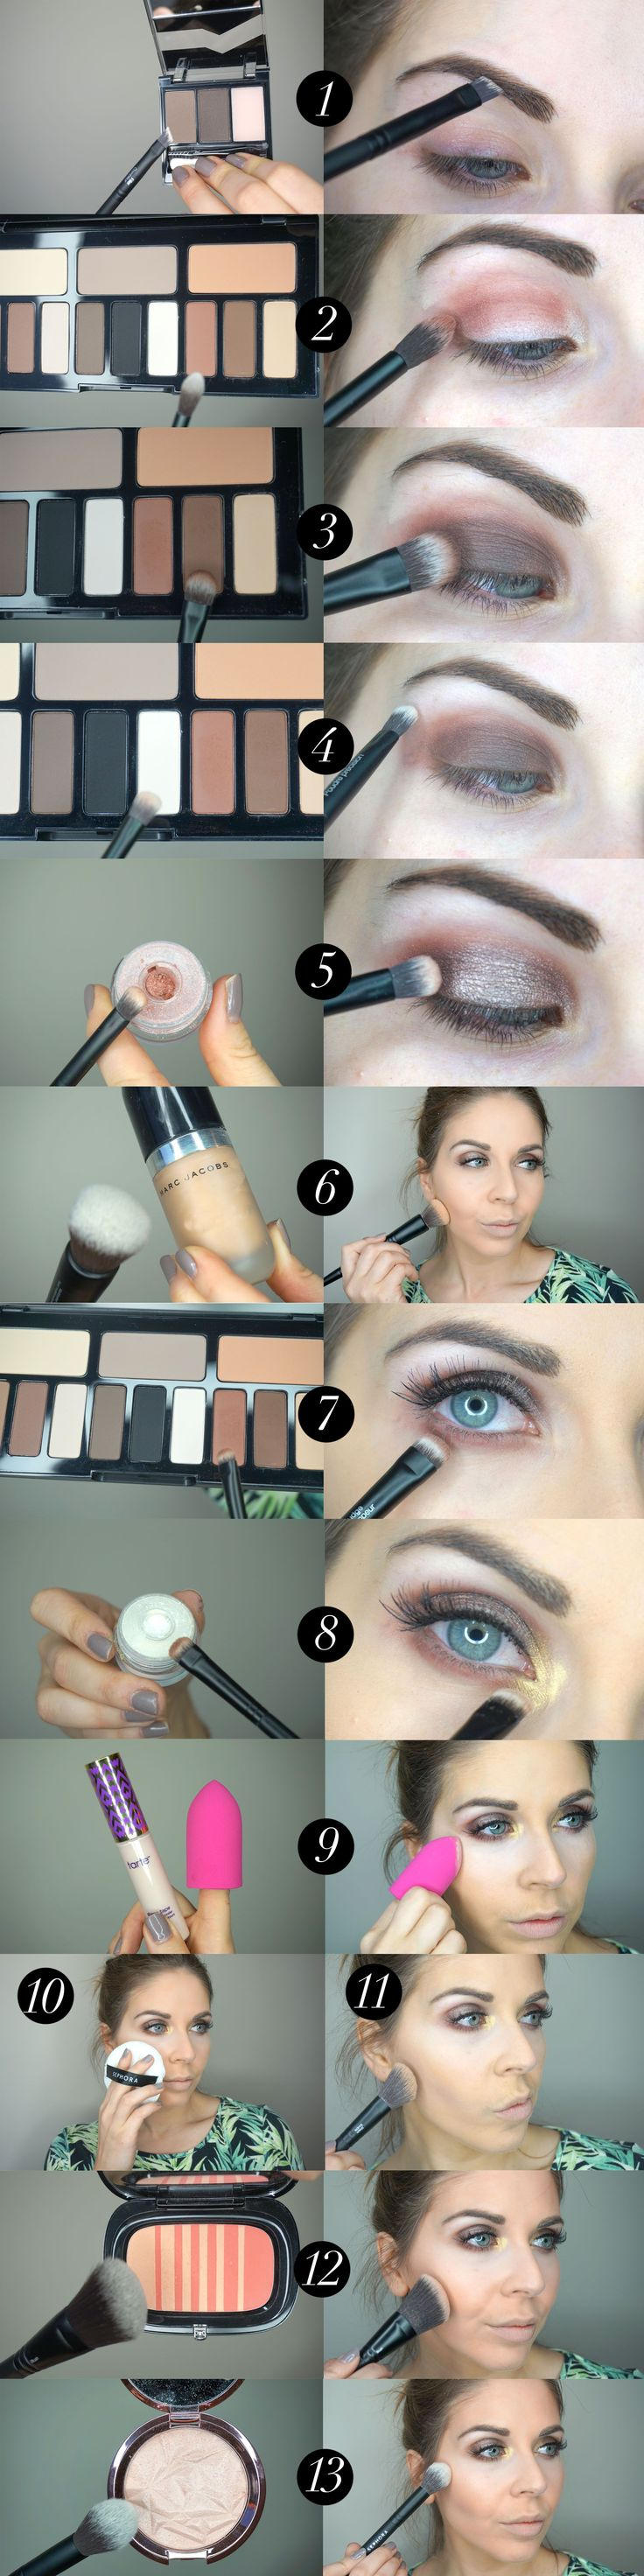 best original eye makeup images on pinterest beauty makeup